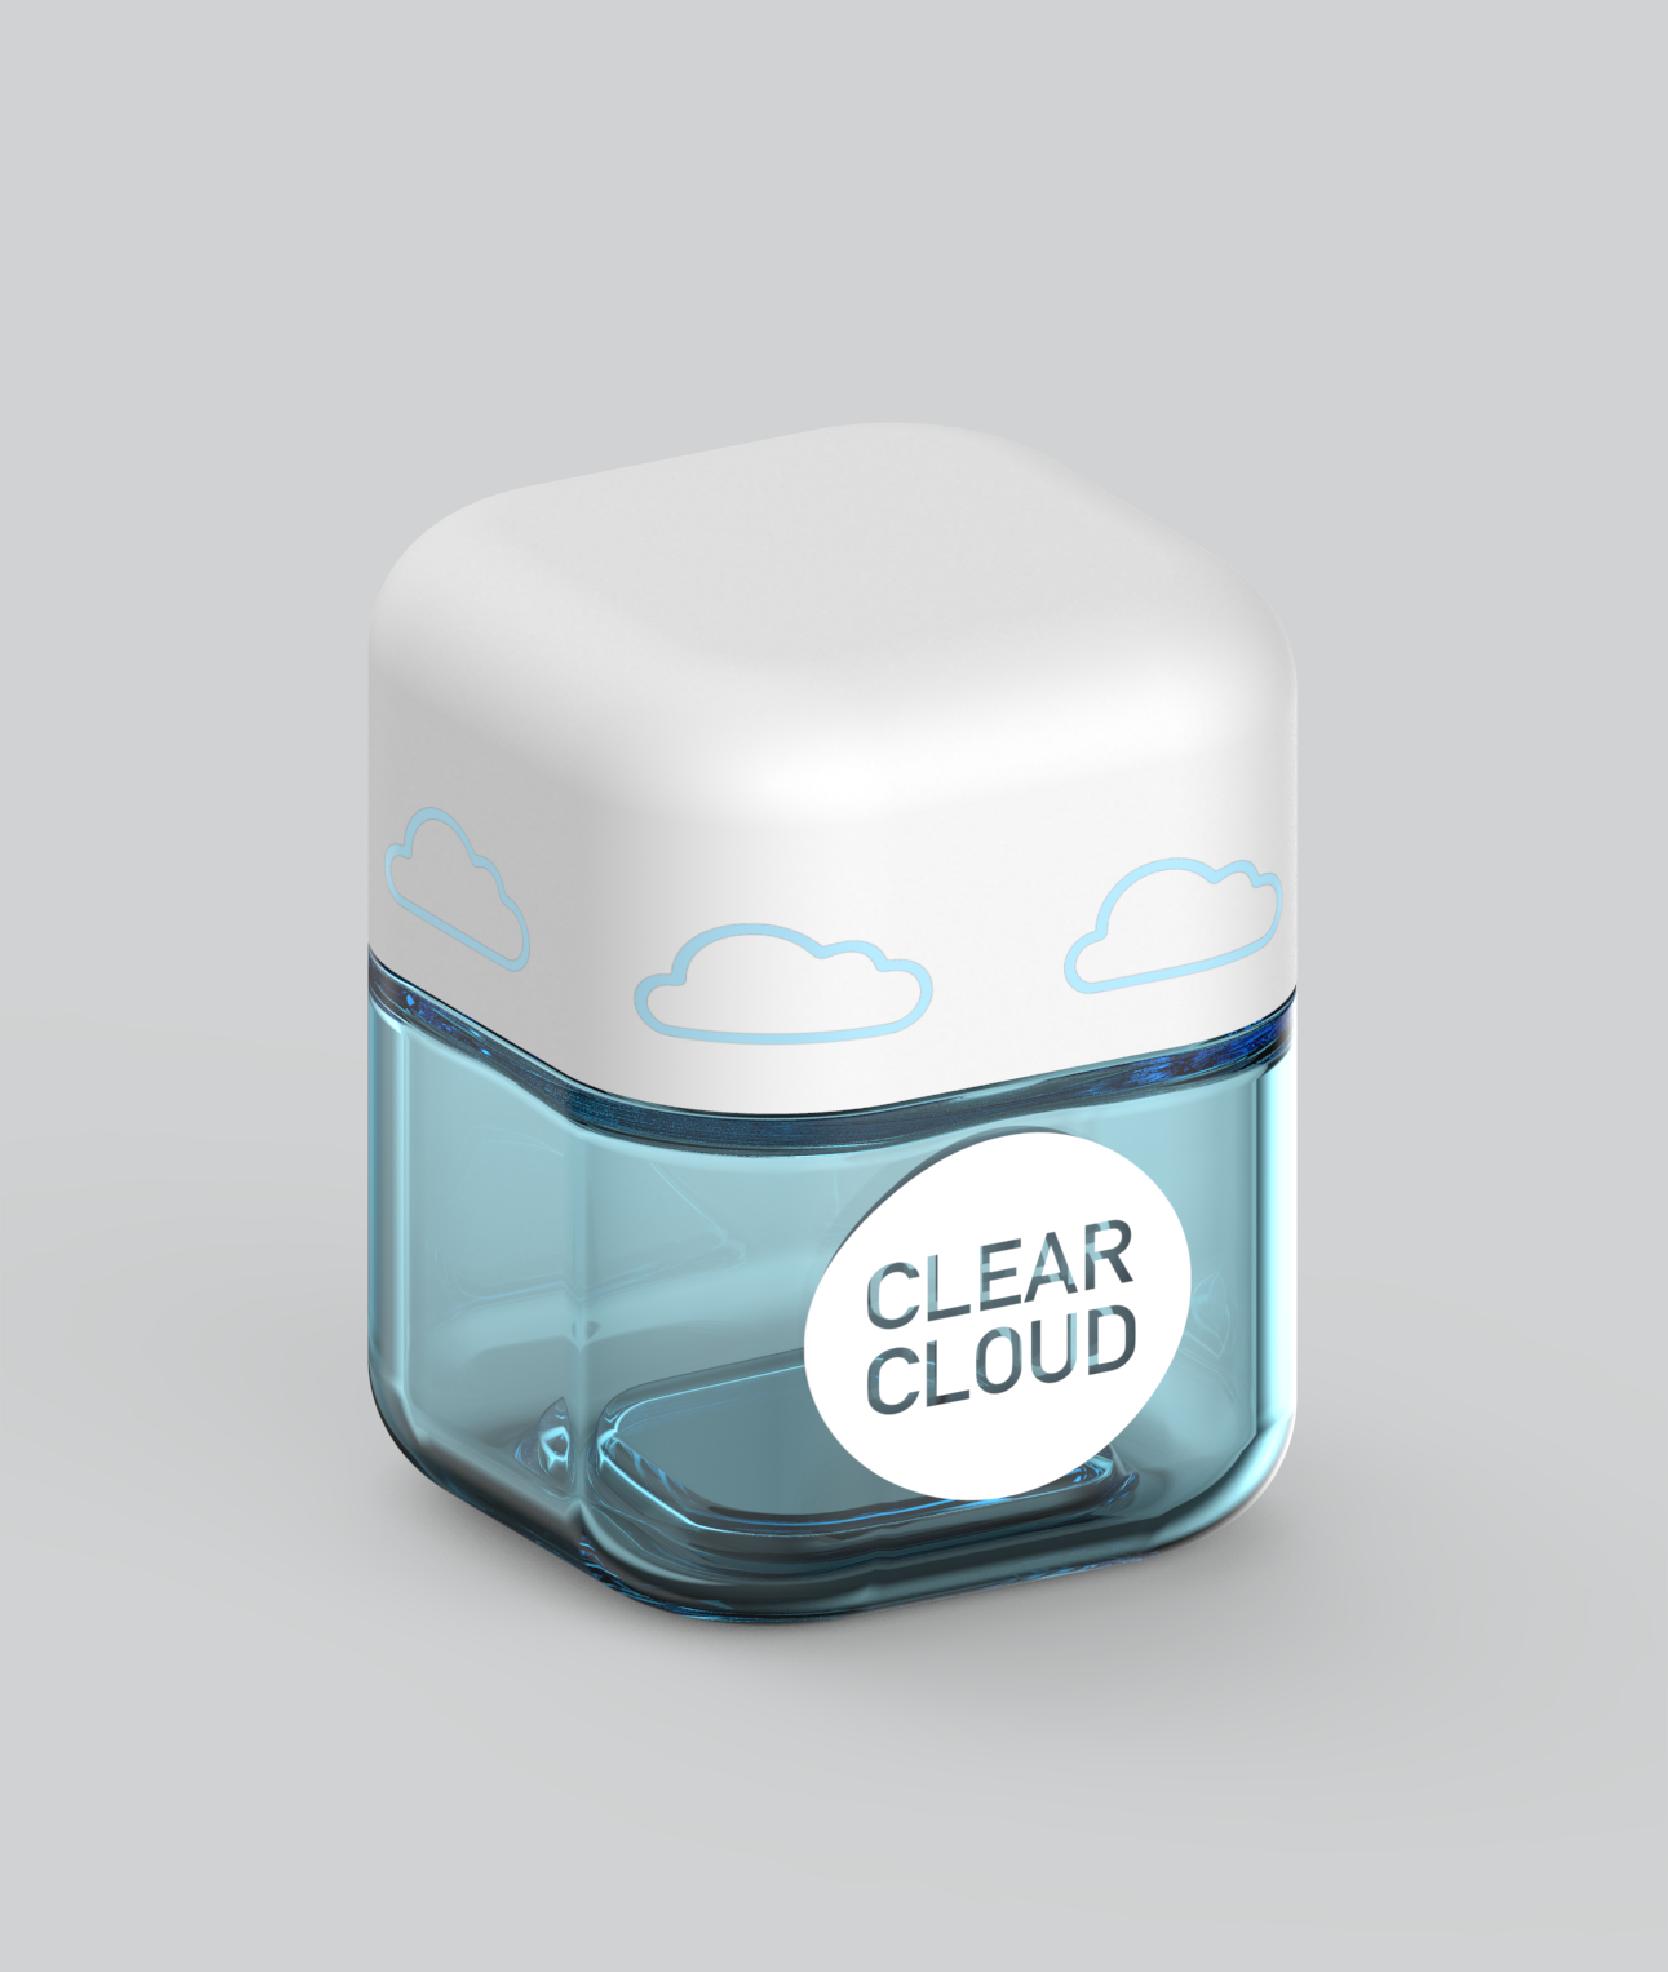 clear-cloud-custom-softsquare-best-weed-jar